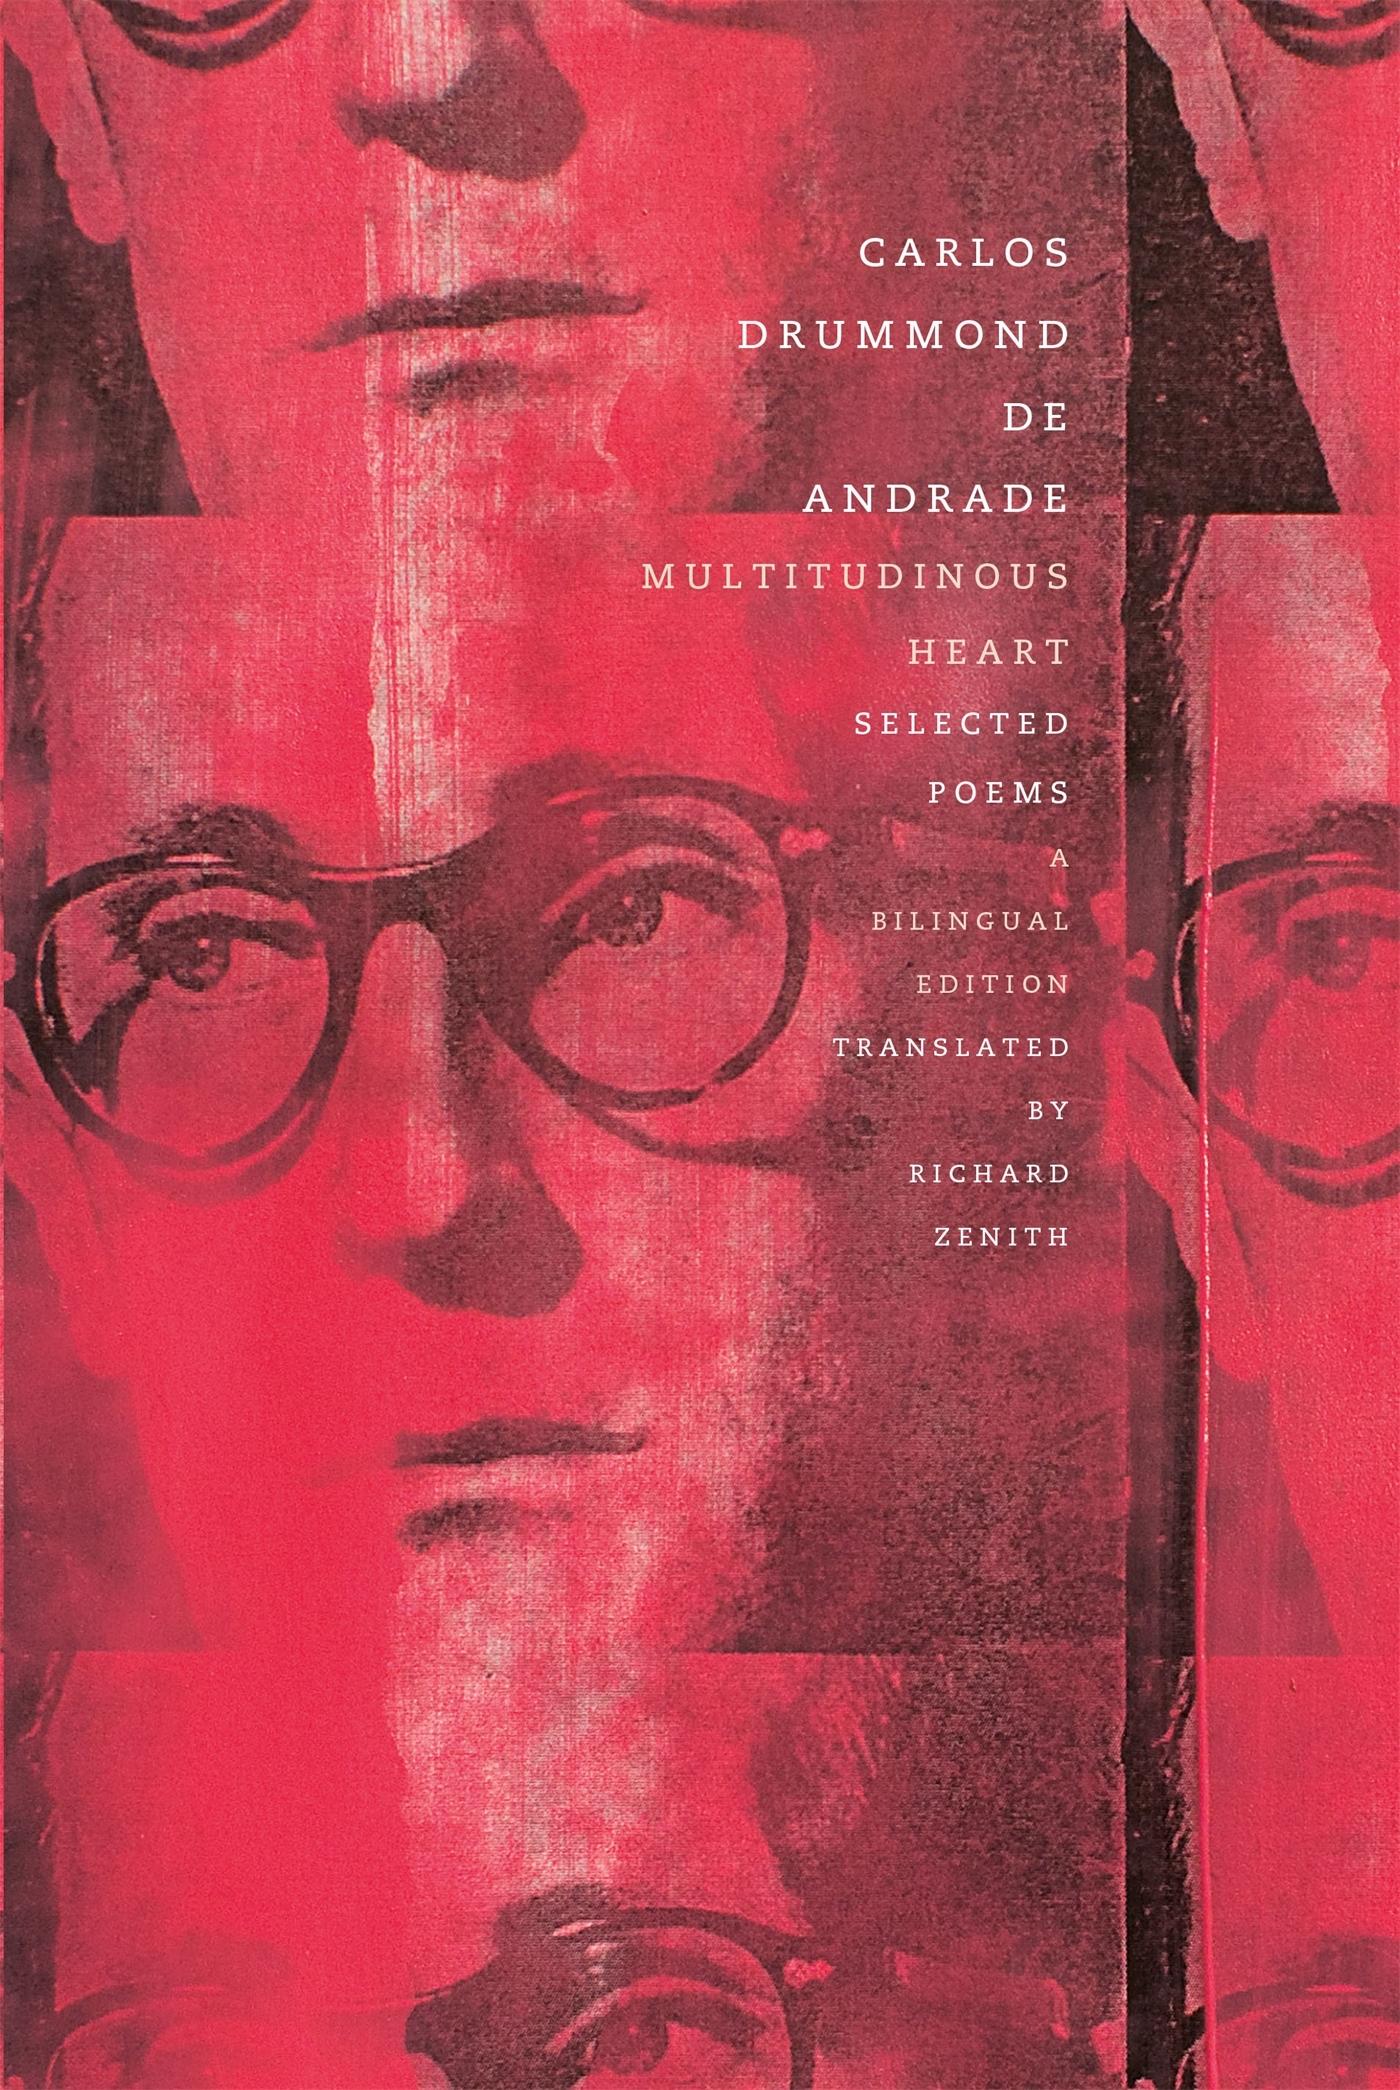 Multitudinous Heart: Selected Poems: A Bilingual Edition Carlos Drummond de Andrade